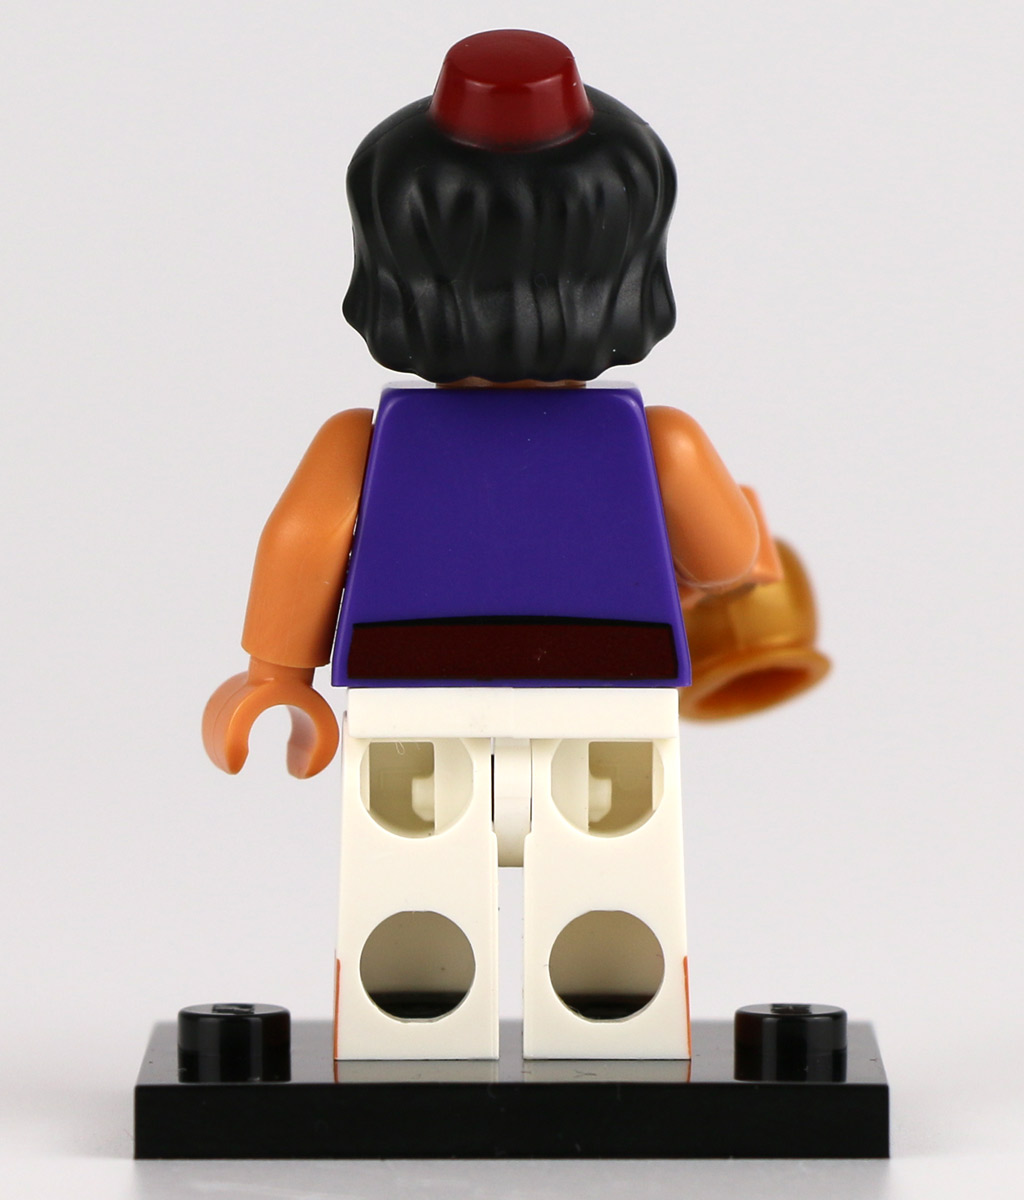 Aladin als Lego Minifigur | © Andres Lehmann  / zusammengebaut.com